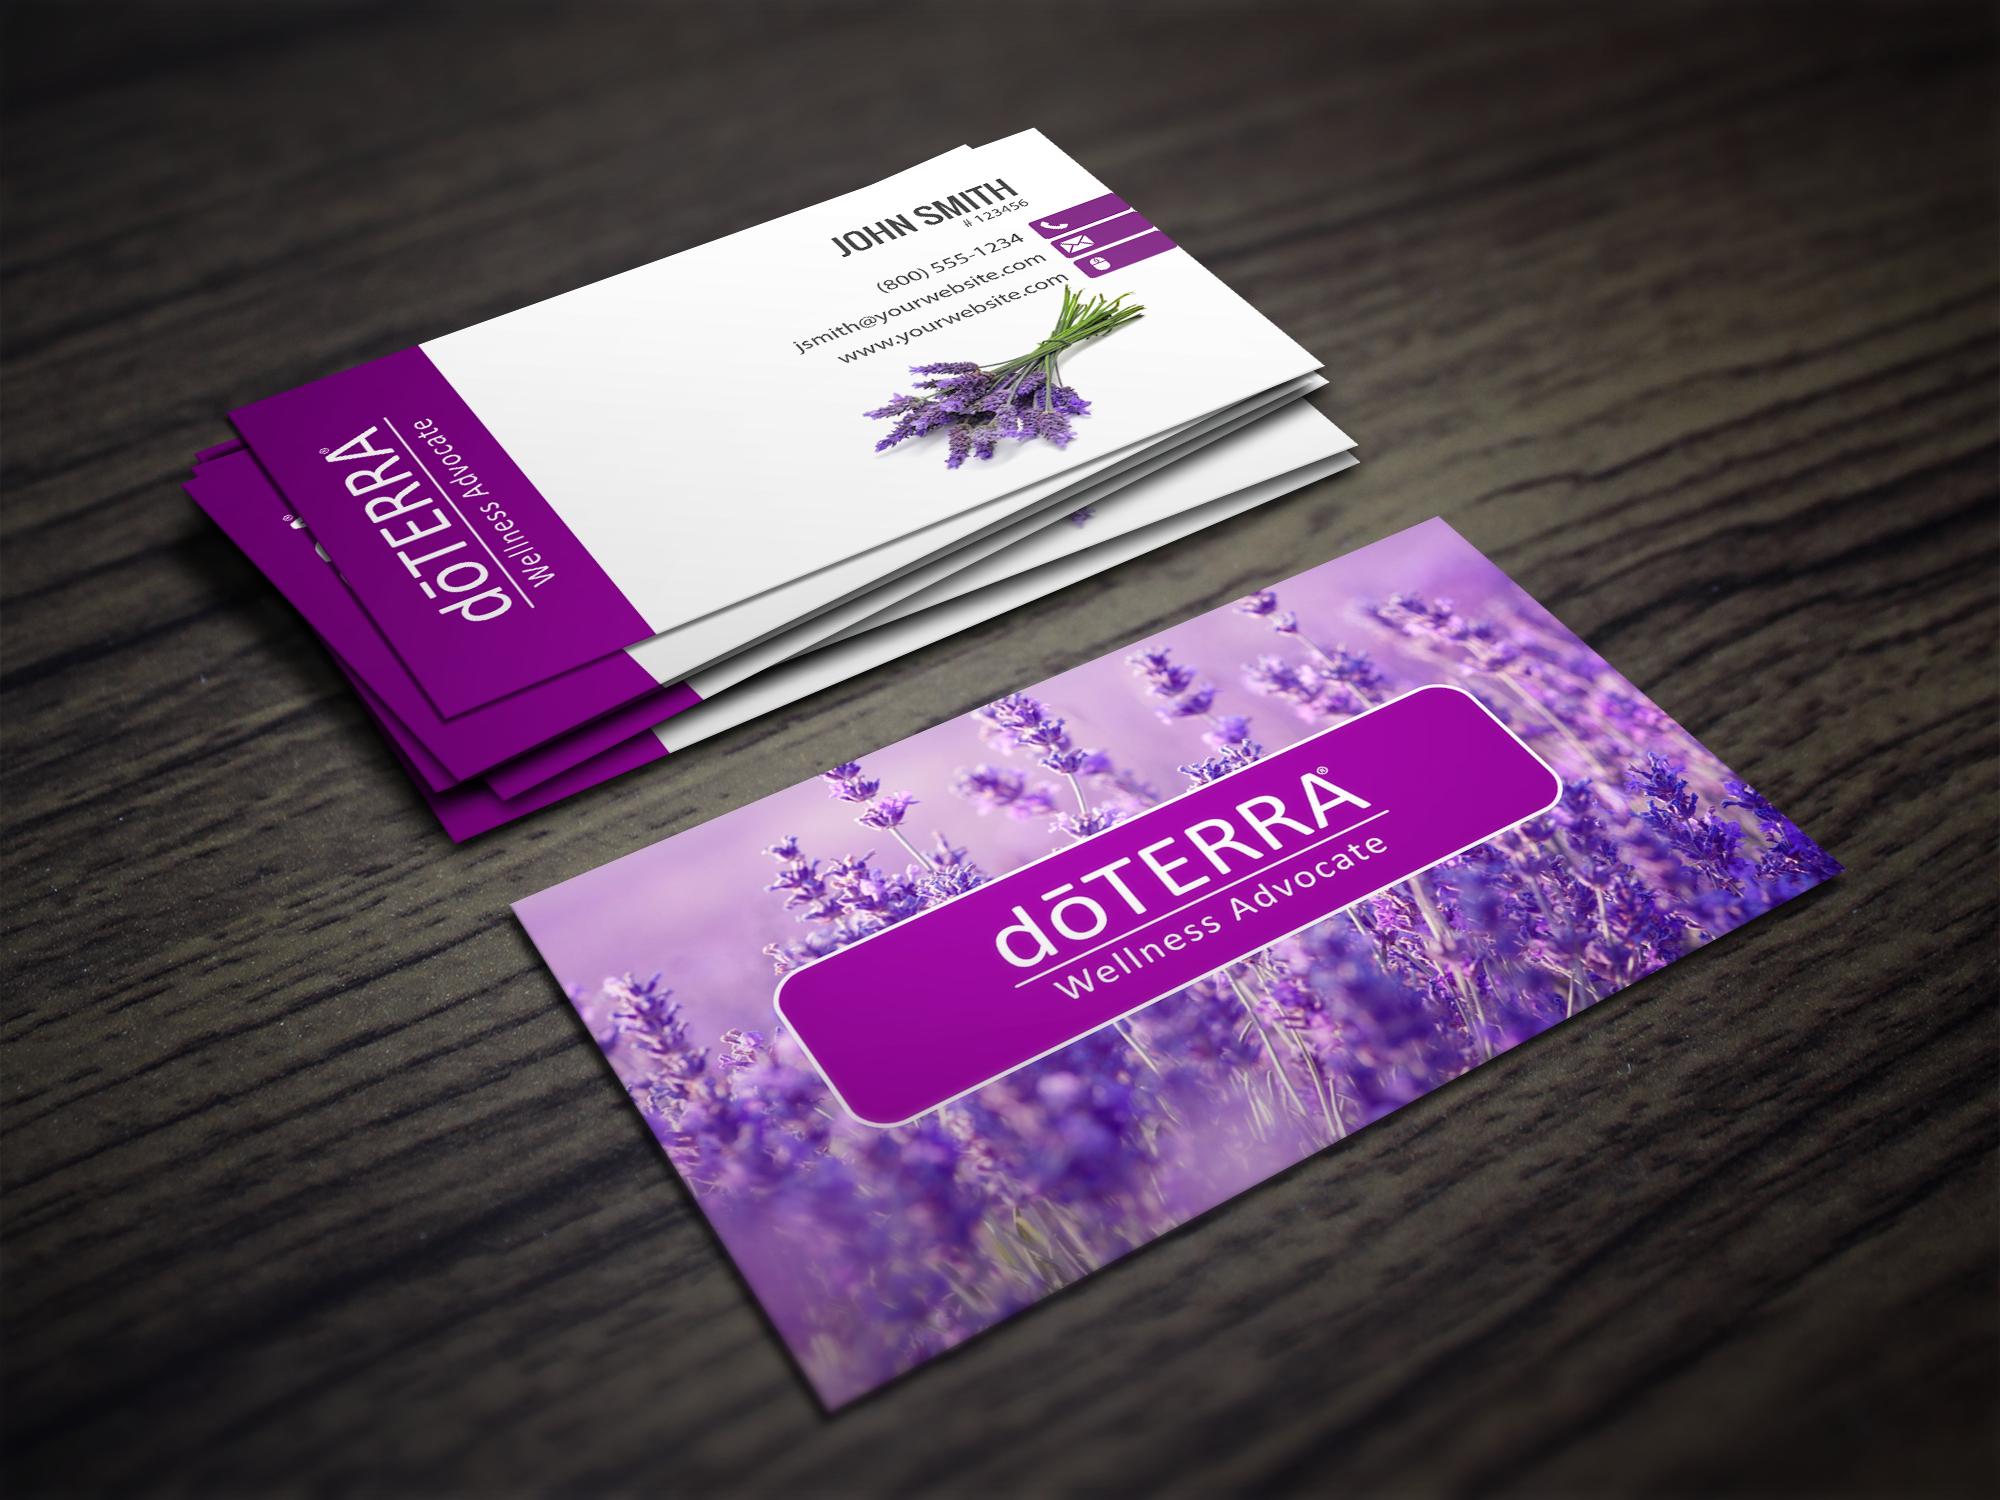 Doterra Business Card In Lavendar Doterra Business Cards Template Doterra Business Cards Free Business Card Templates